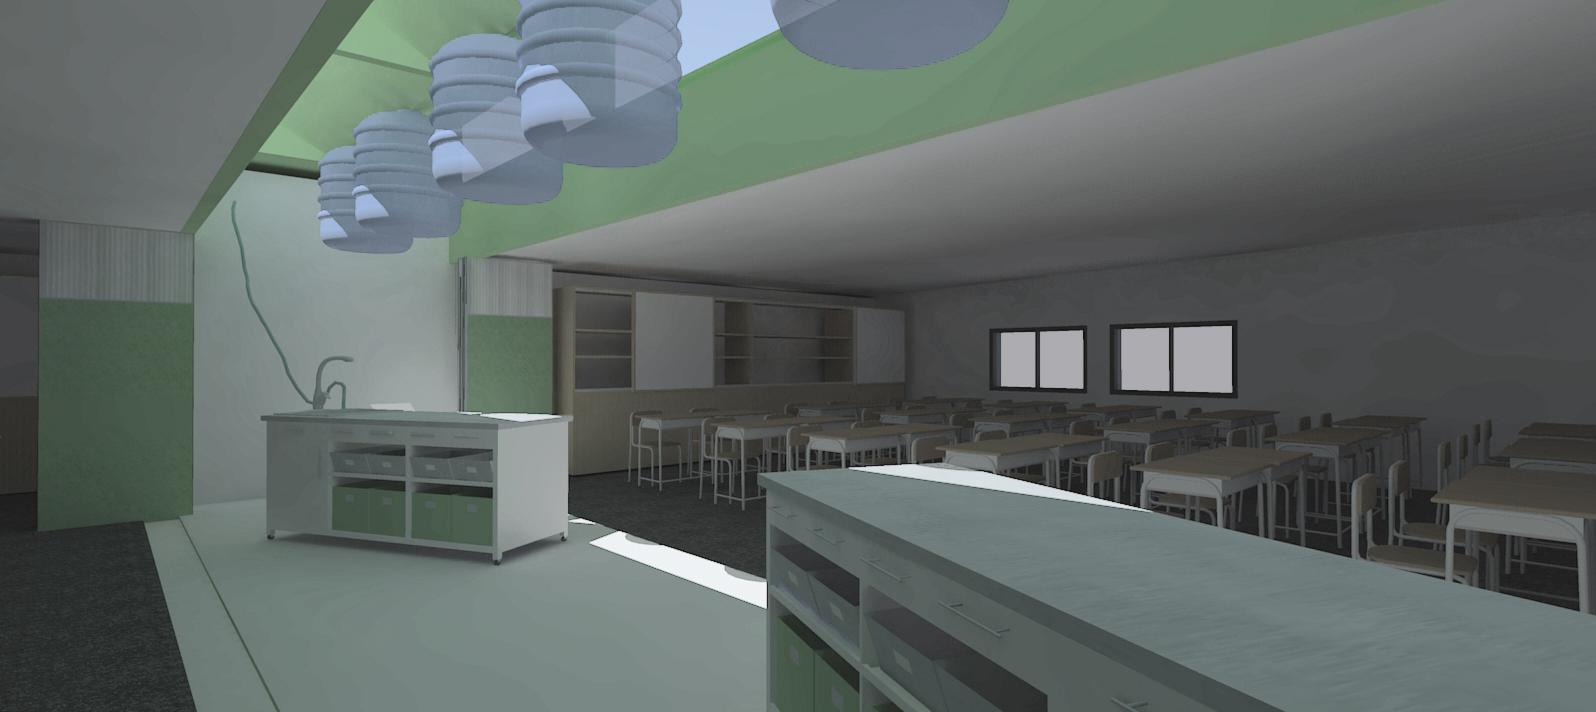 interior02 copy.jpg